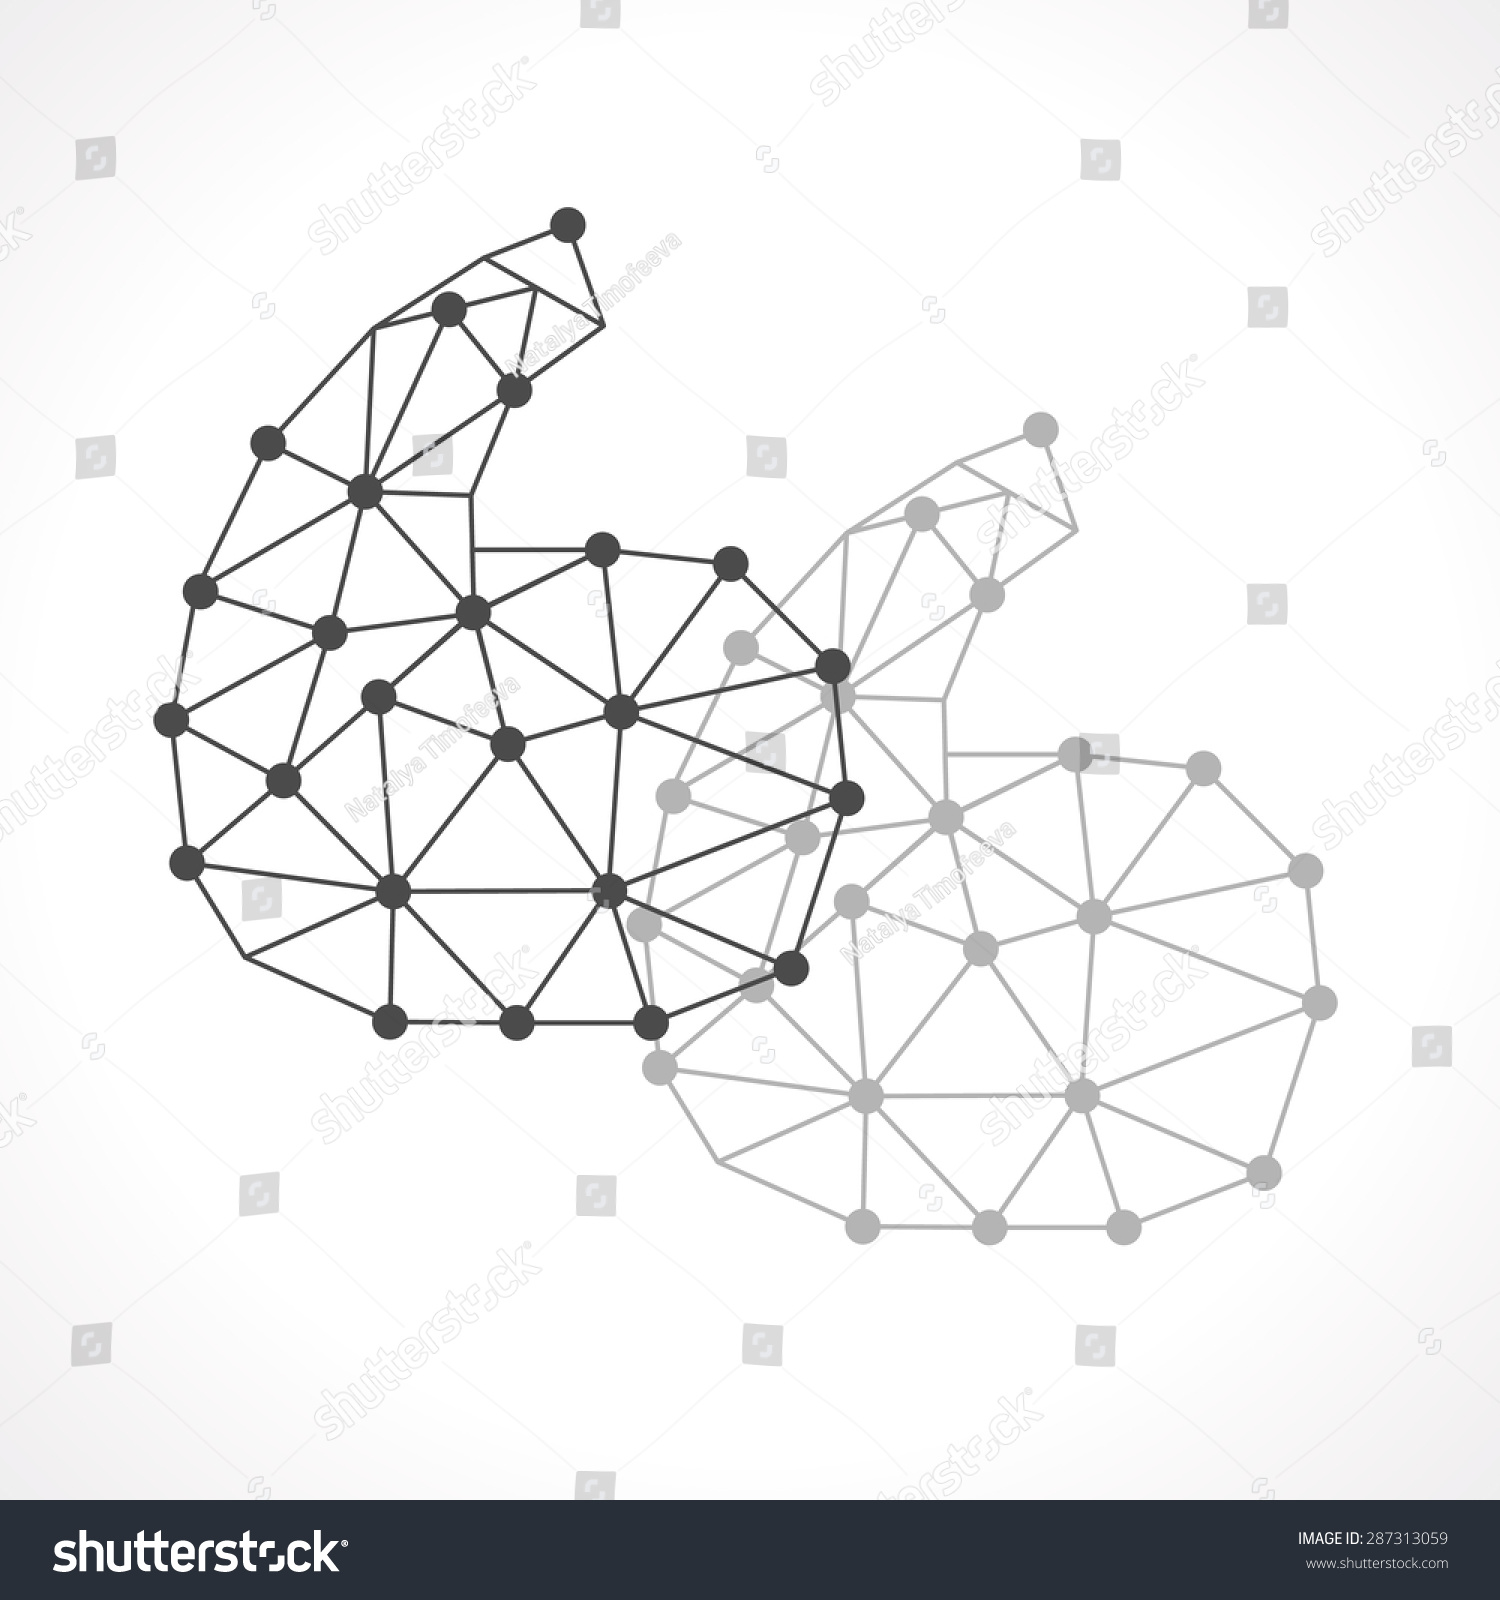 Polygonal Geometric Intersecting Quotation Marks Symbol Stock Vector